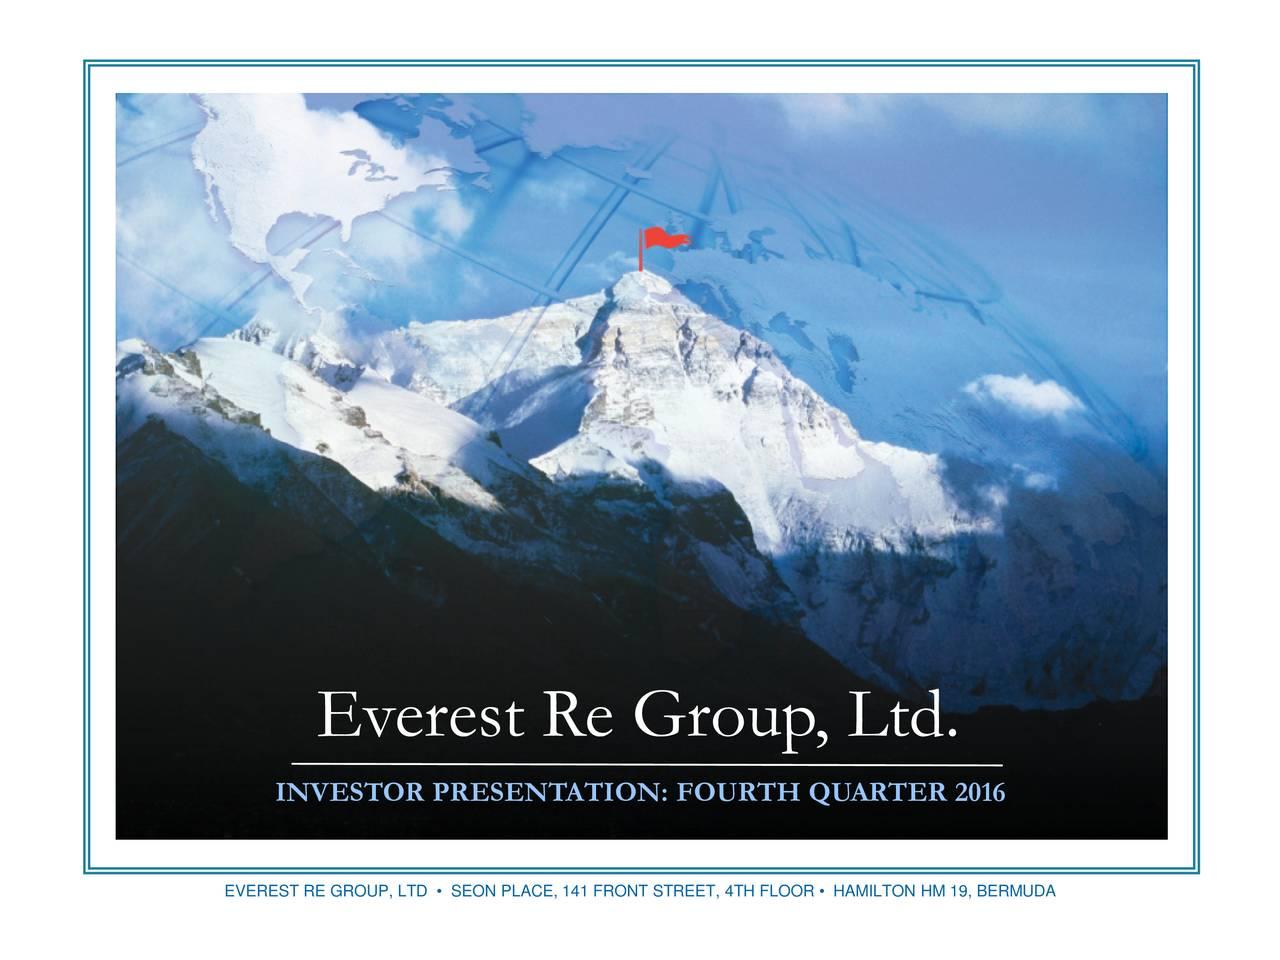 Everest Re Group, Ltd. Everest Re Group, Ltd. INVESTOR PRESENTATION: FOURTH QUARTER 2016 EVEREST RE GROUP, LTD  SEON PLACE, 141 FRONT STREET, 4TH FLOOR  HAMILTON HM 19, BERMUDA